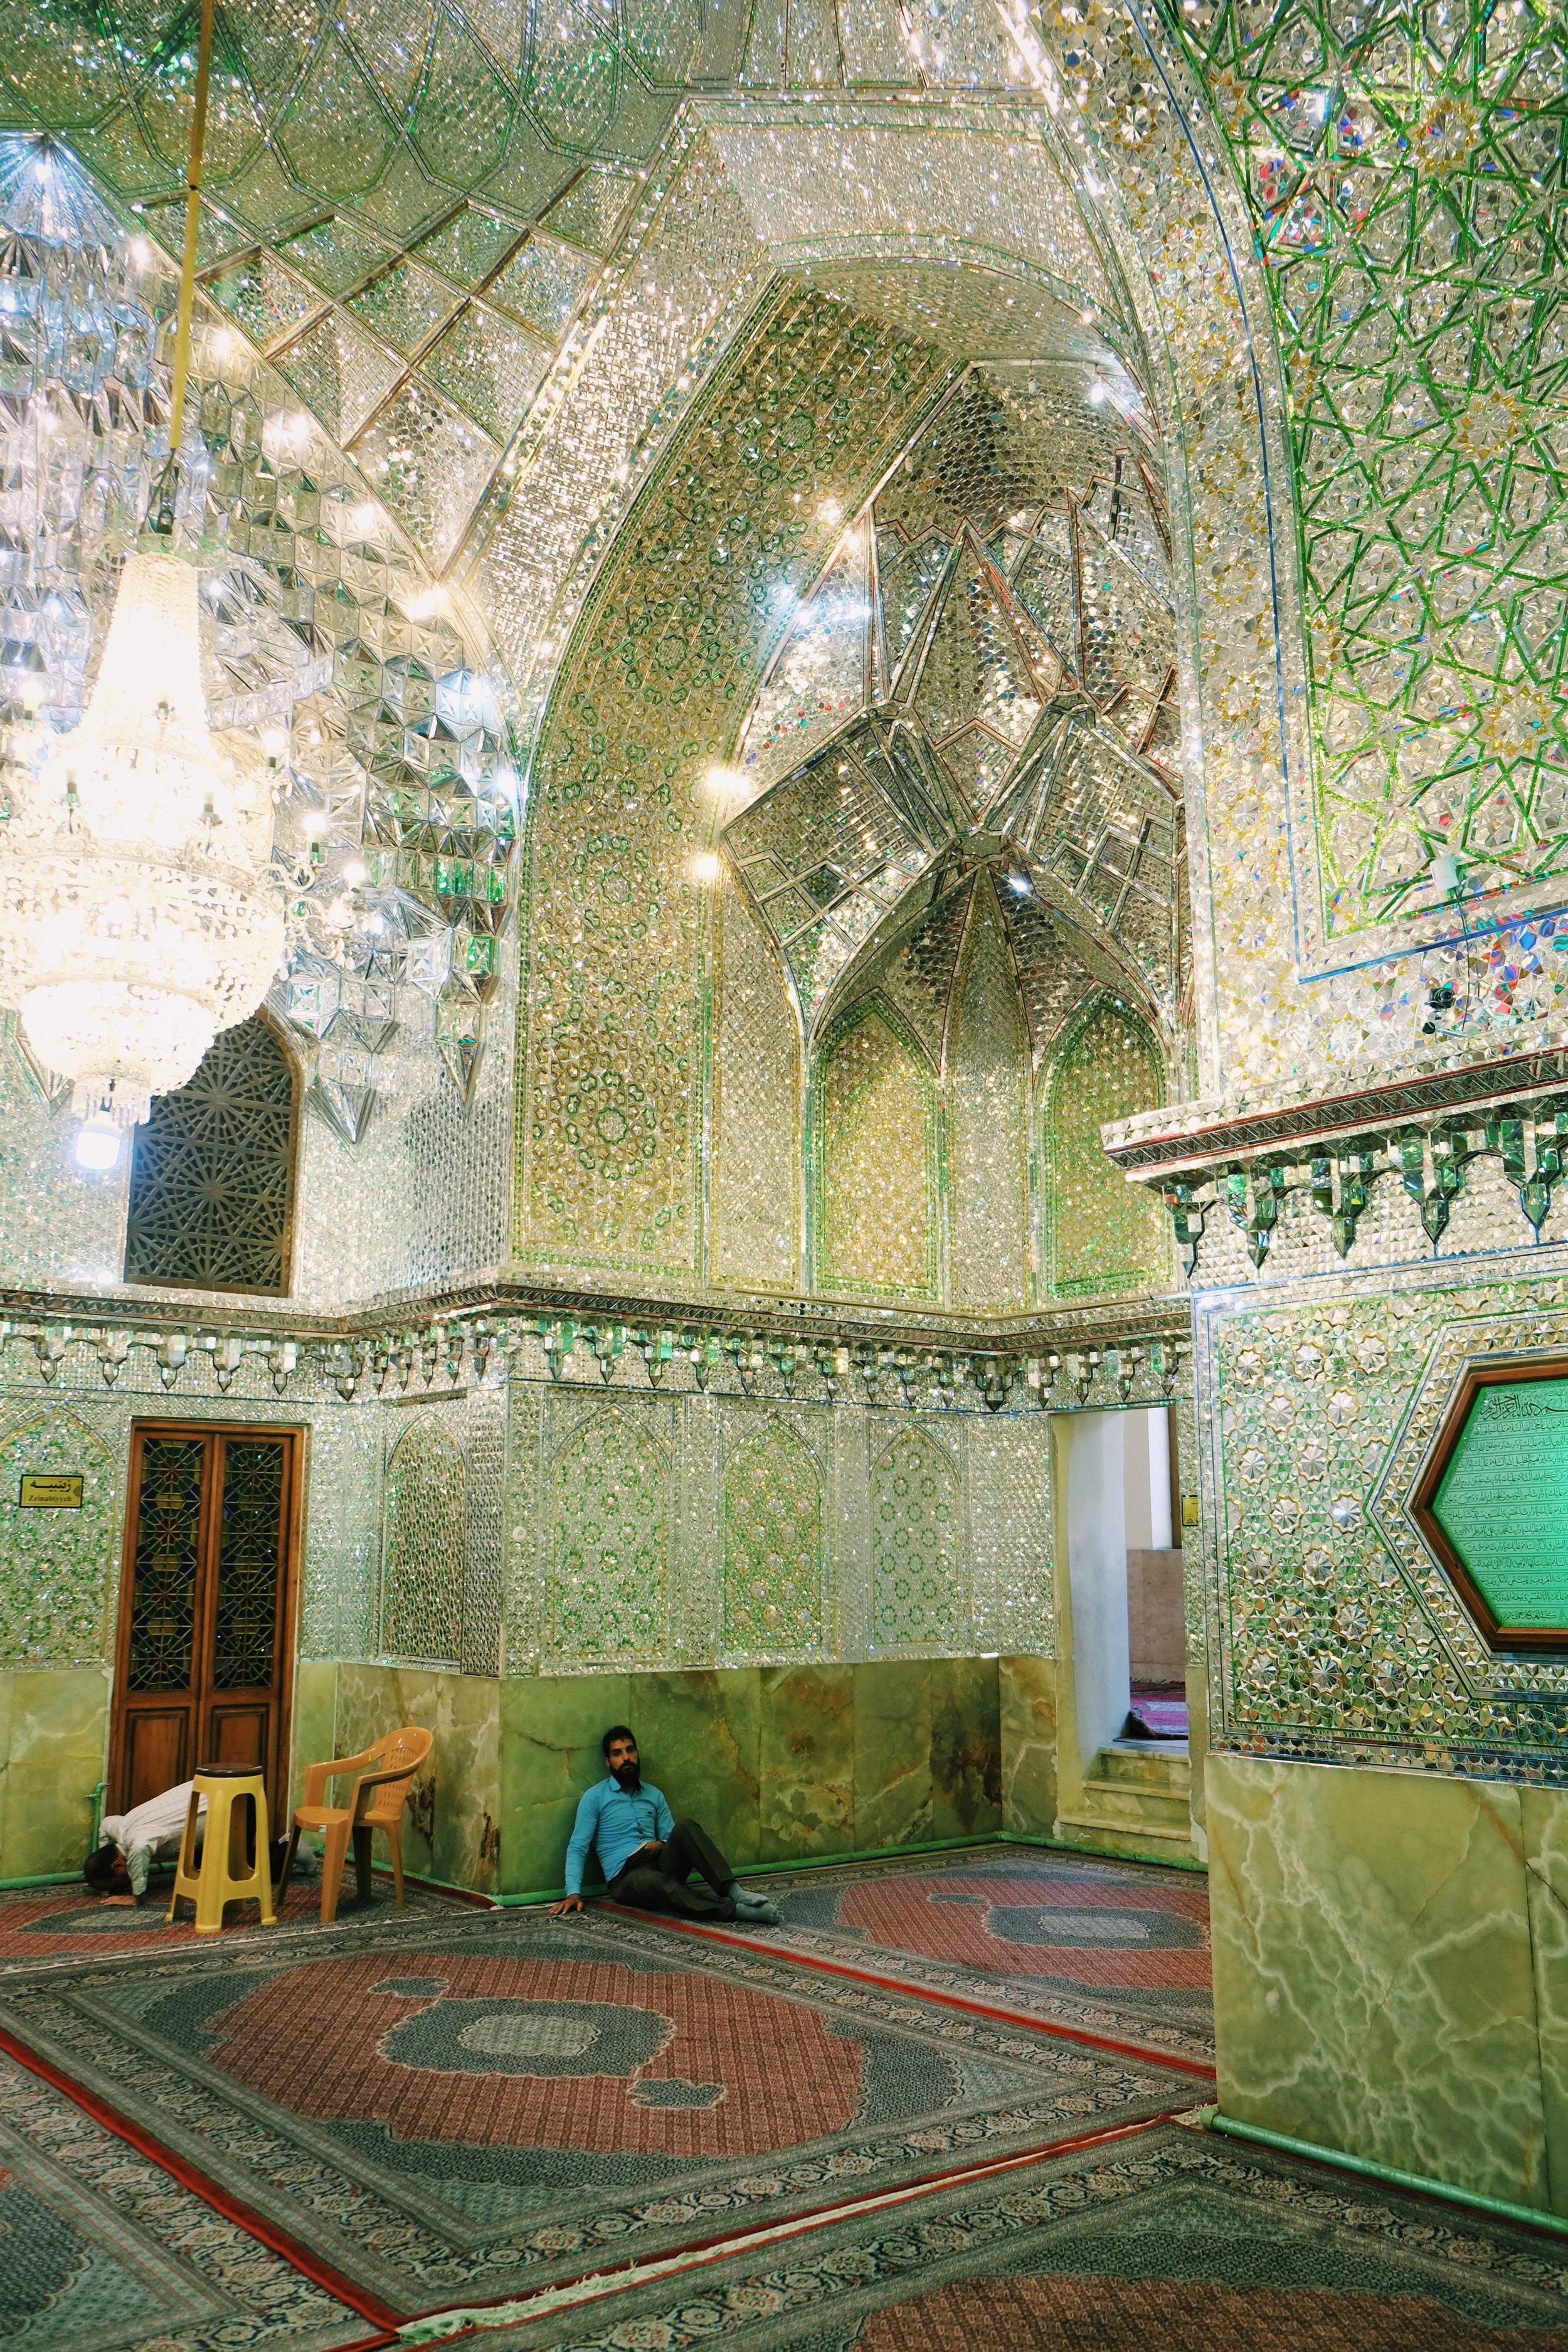 Esfahan Green Mosque in Esfahan in Iran by Joost Bastmeijer.jpeg